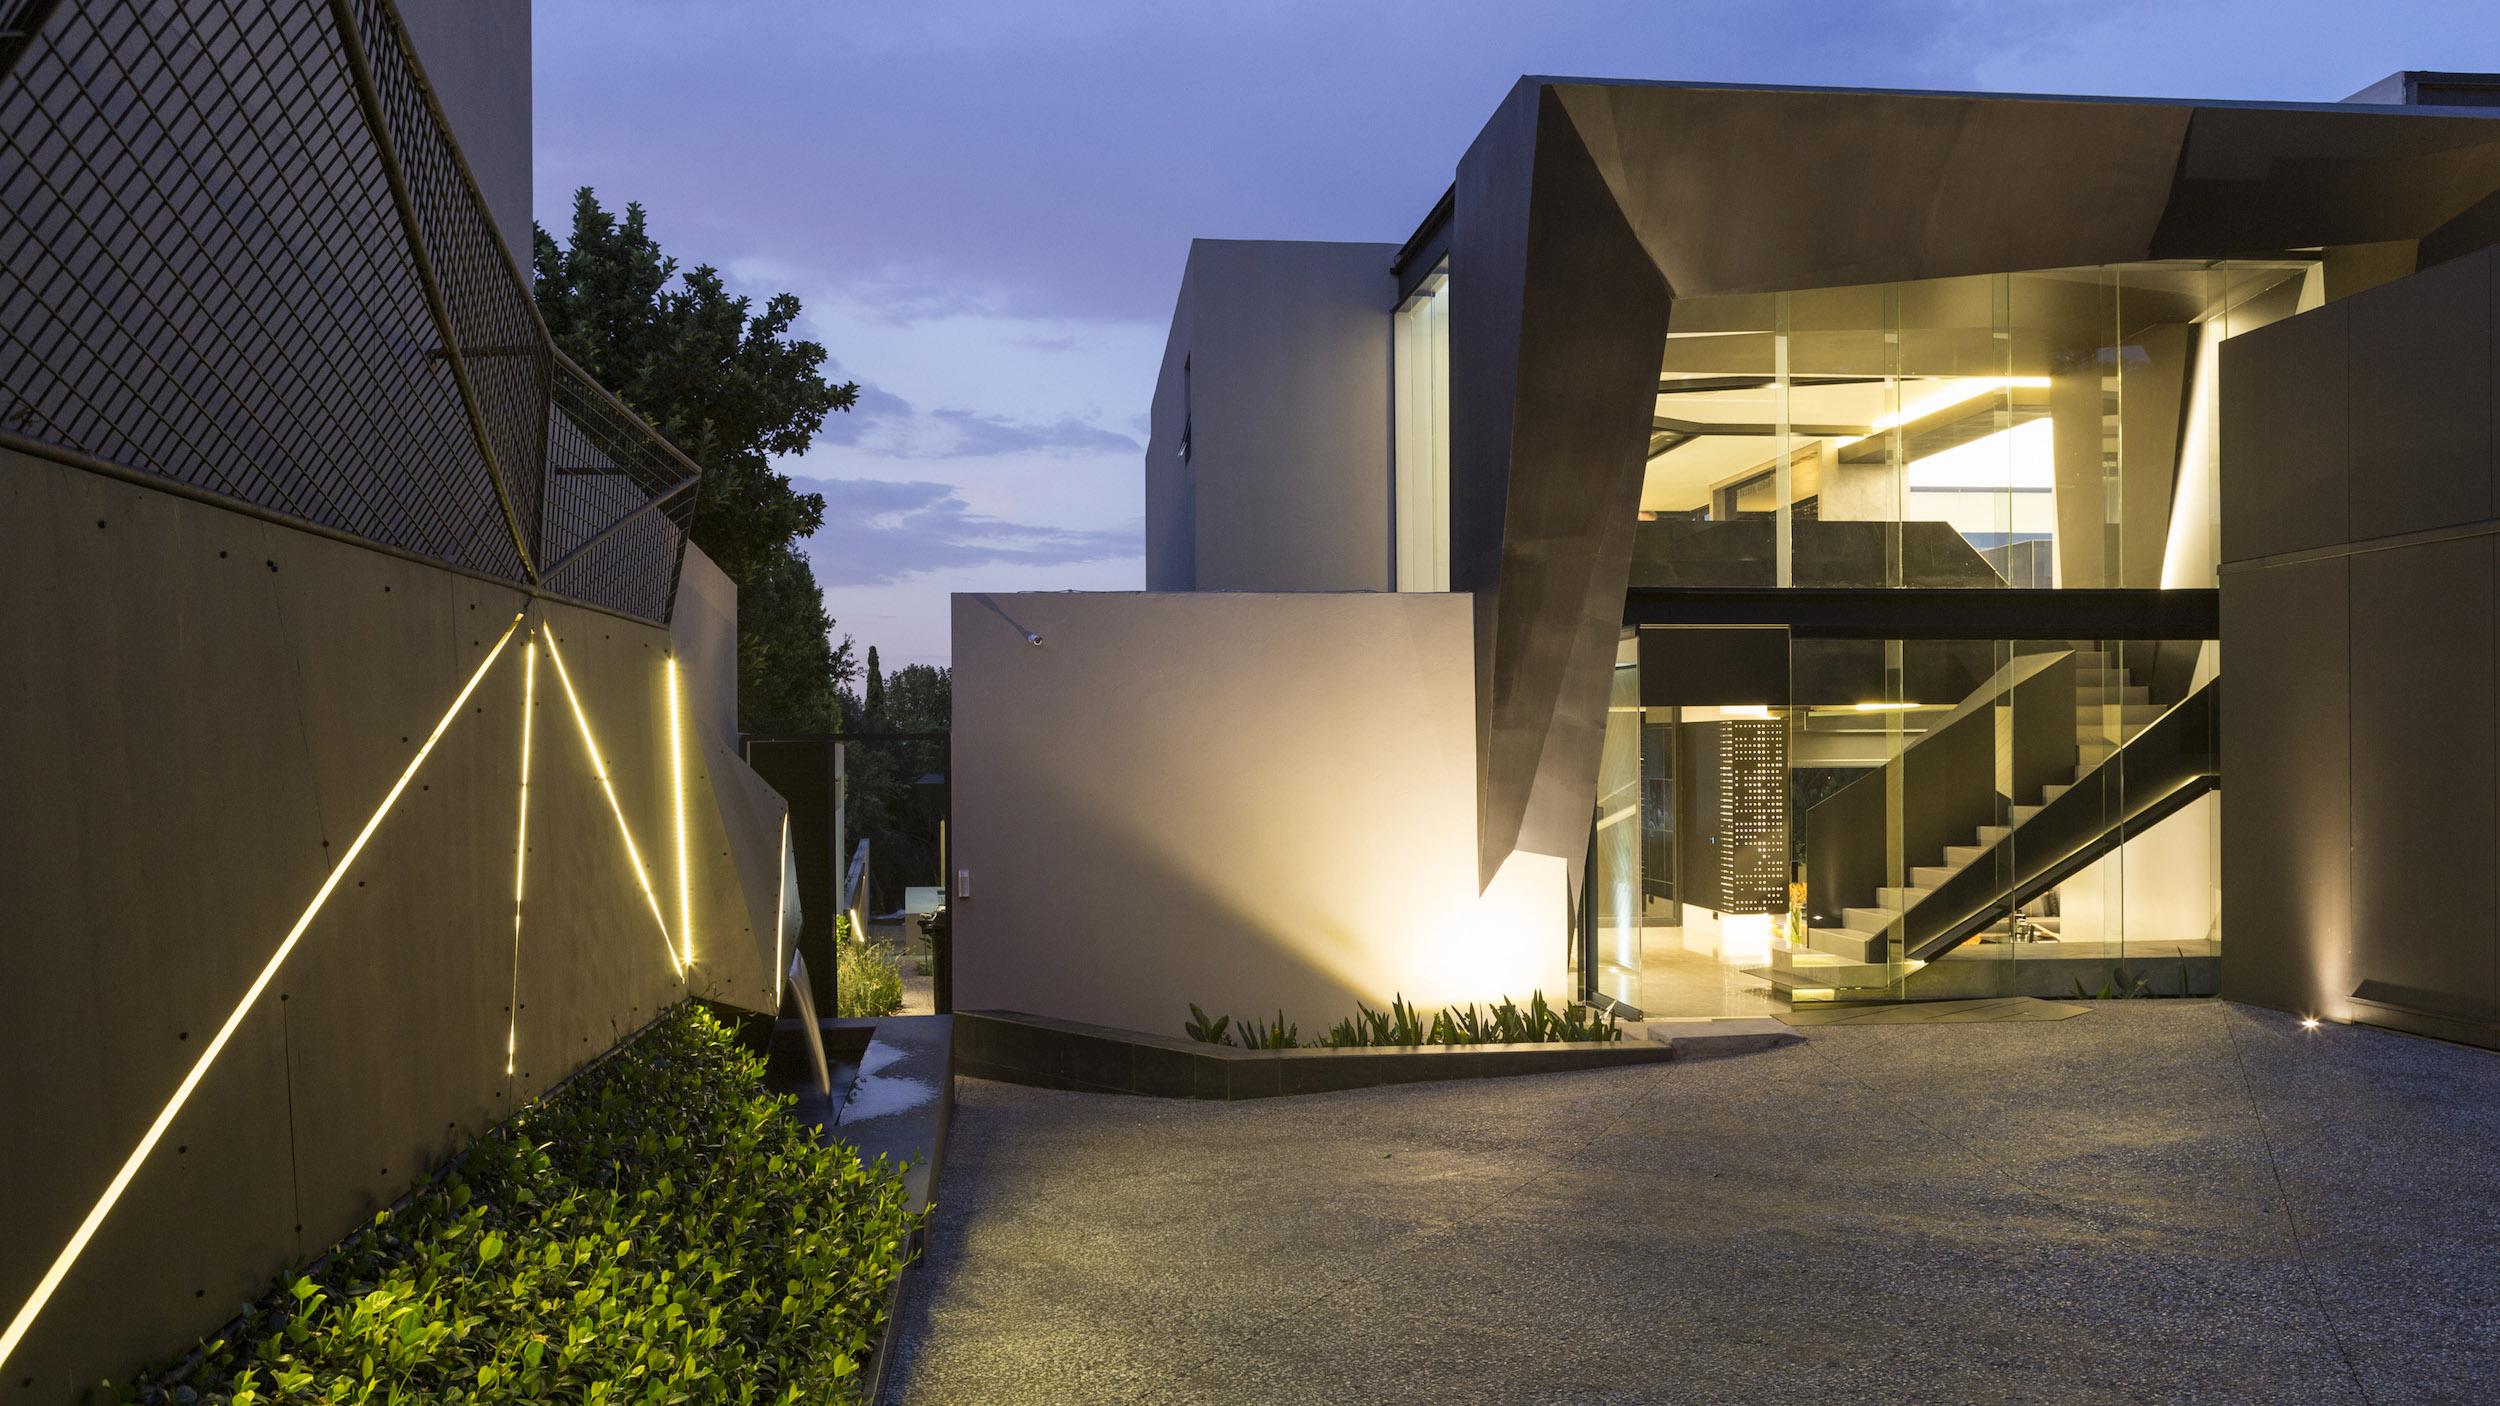 Kloof Road Masterpiece House in Johannesburg by Nico van der Meulen Architects-03